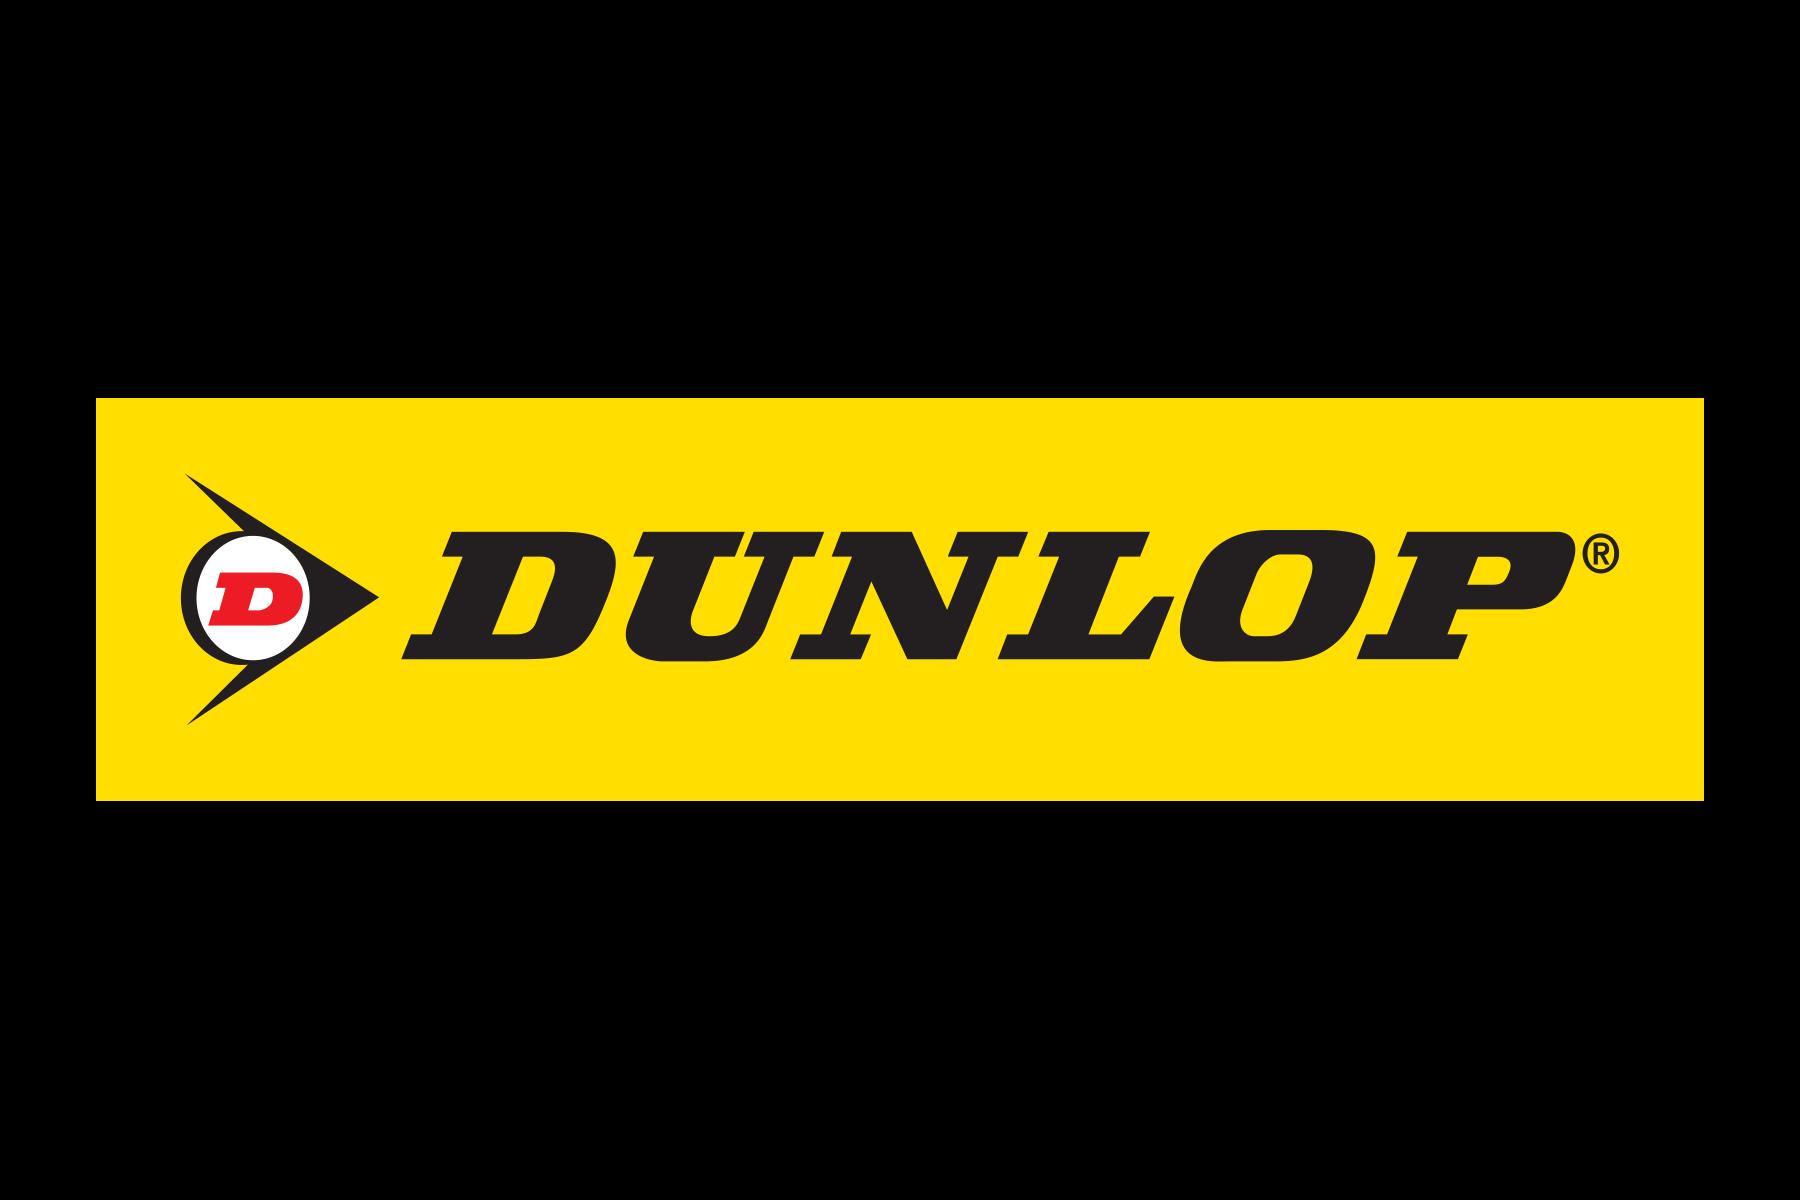 Dunlop PNG - 110424